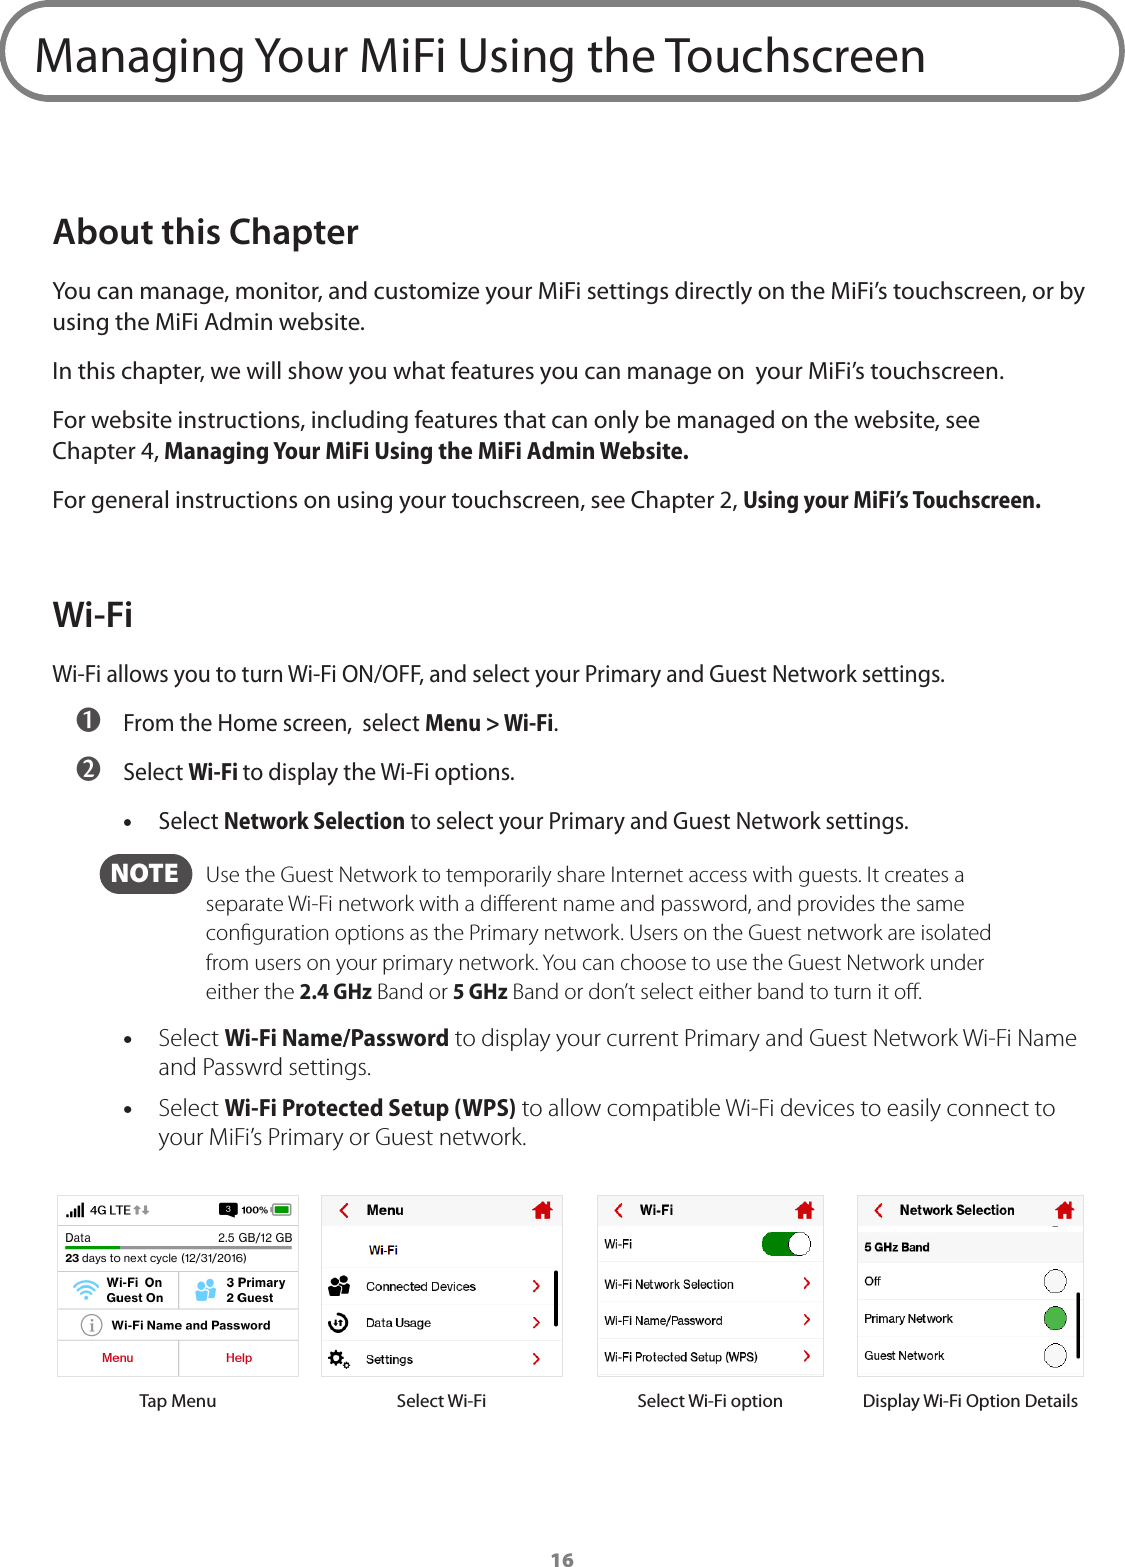 novatel wireless mifi 6630 manual